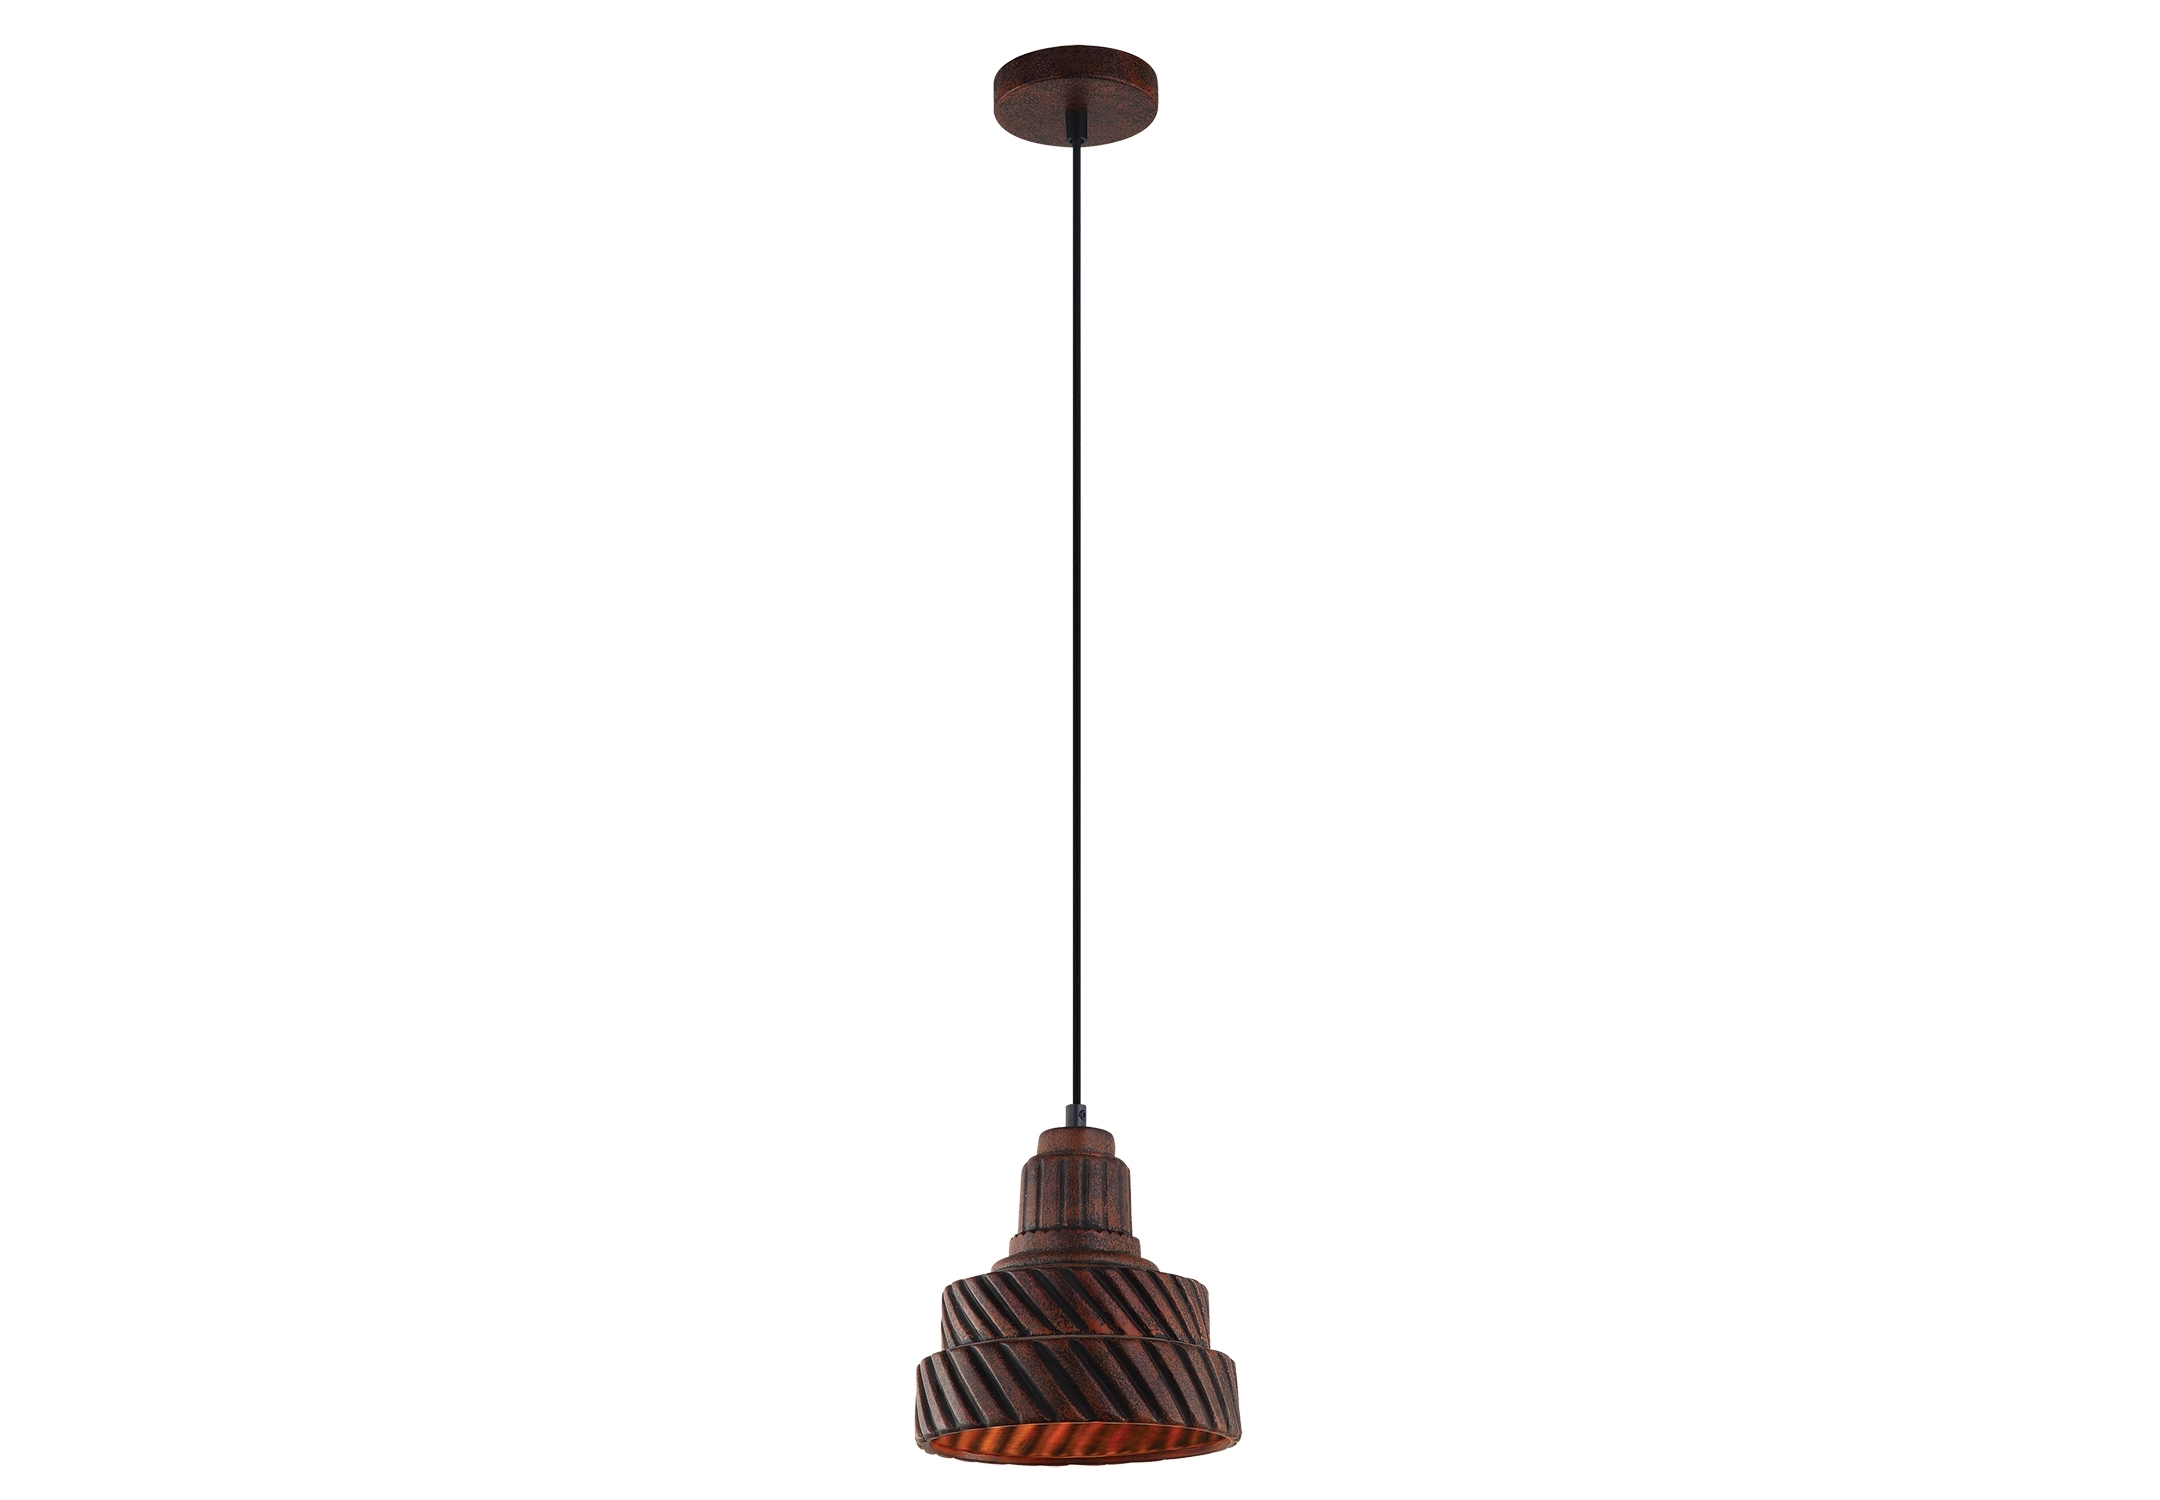 Подвесной светильникПодвесные светильники<br>&amp;lt;div&amp;gt;Цоколь: E27&amp;lt;/div&amp;gt;&amp;lt;div&amp;gt;Мощность ламп: 60W&amp;lt;/div&amp;gt;&amp;lt;div&amp;gt;Количество лампочек: 1&amp;amp;nbsp;(в комплекте)&amp;lt;/div&amp;gt;<br><br>Material: Керамика<br>Height см: 140<br>Diameter см: 19